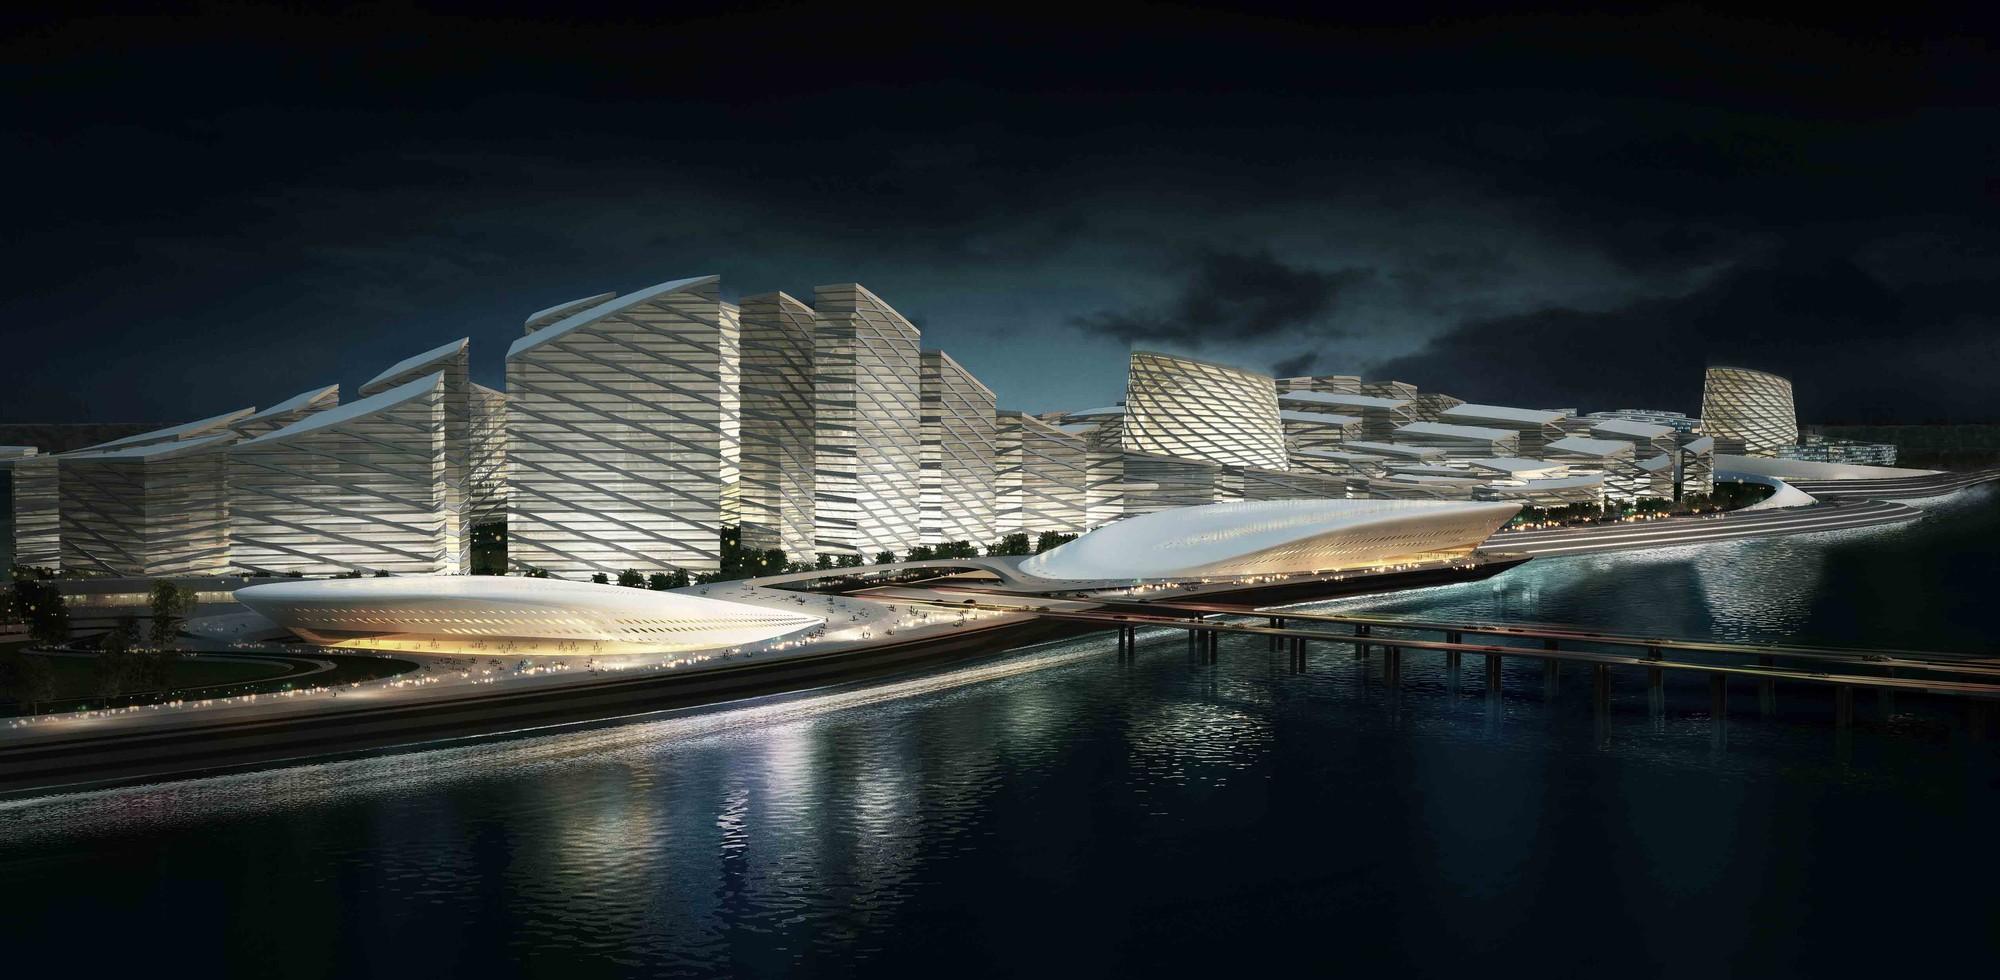 Kanpur Riverfront Development Proposal / Studio Symbiosis, Courtesy of Studio Symbiosis